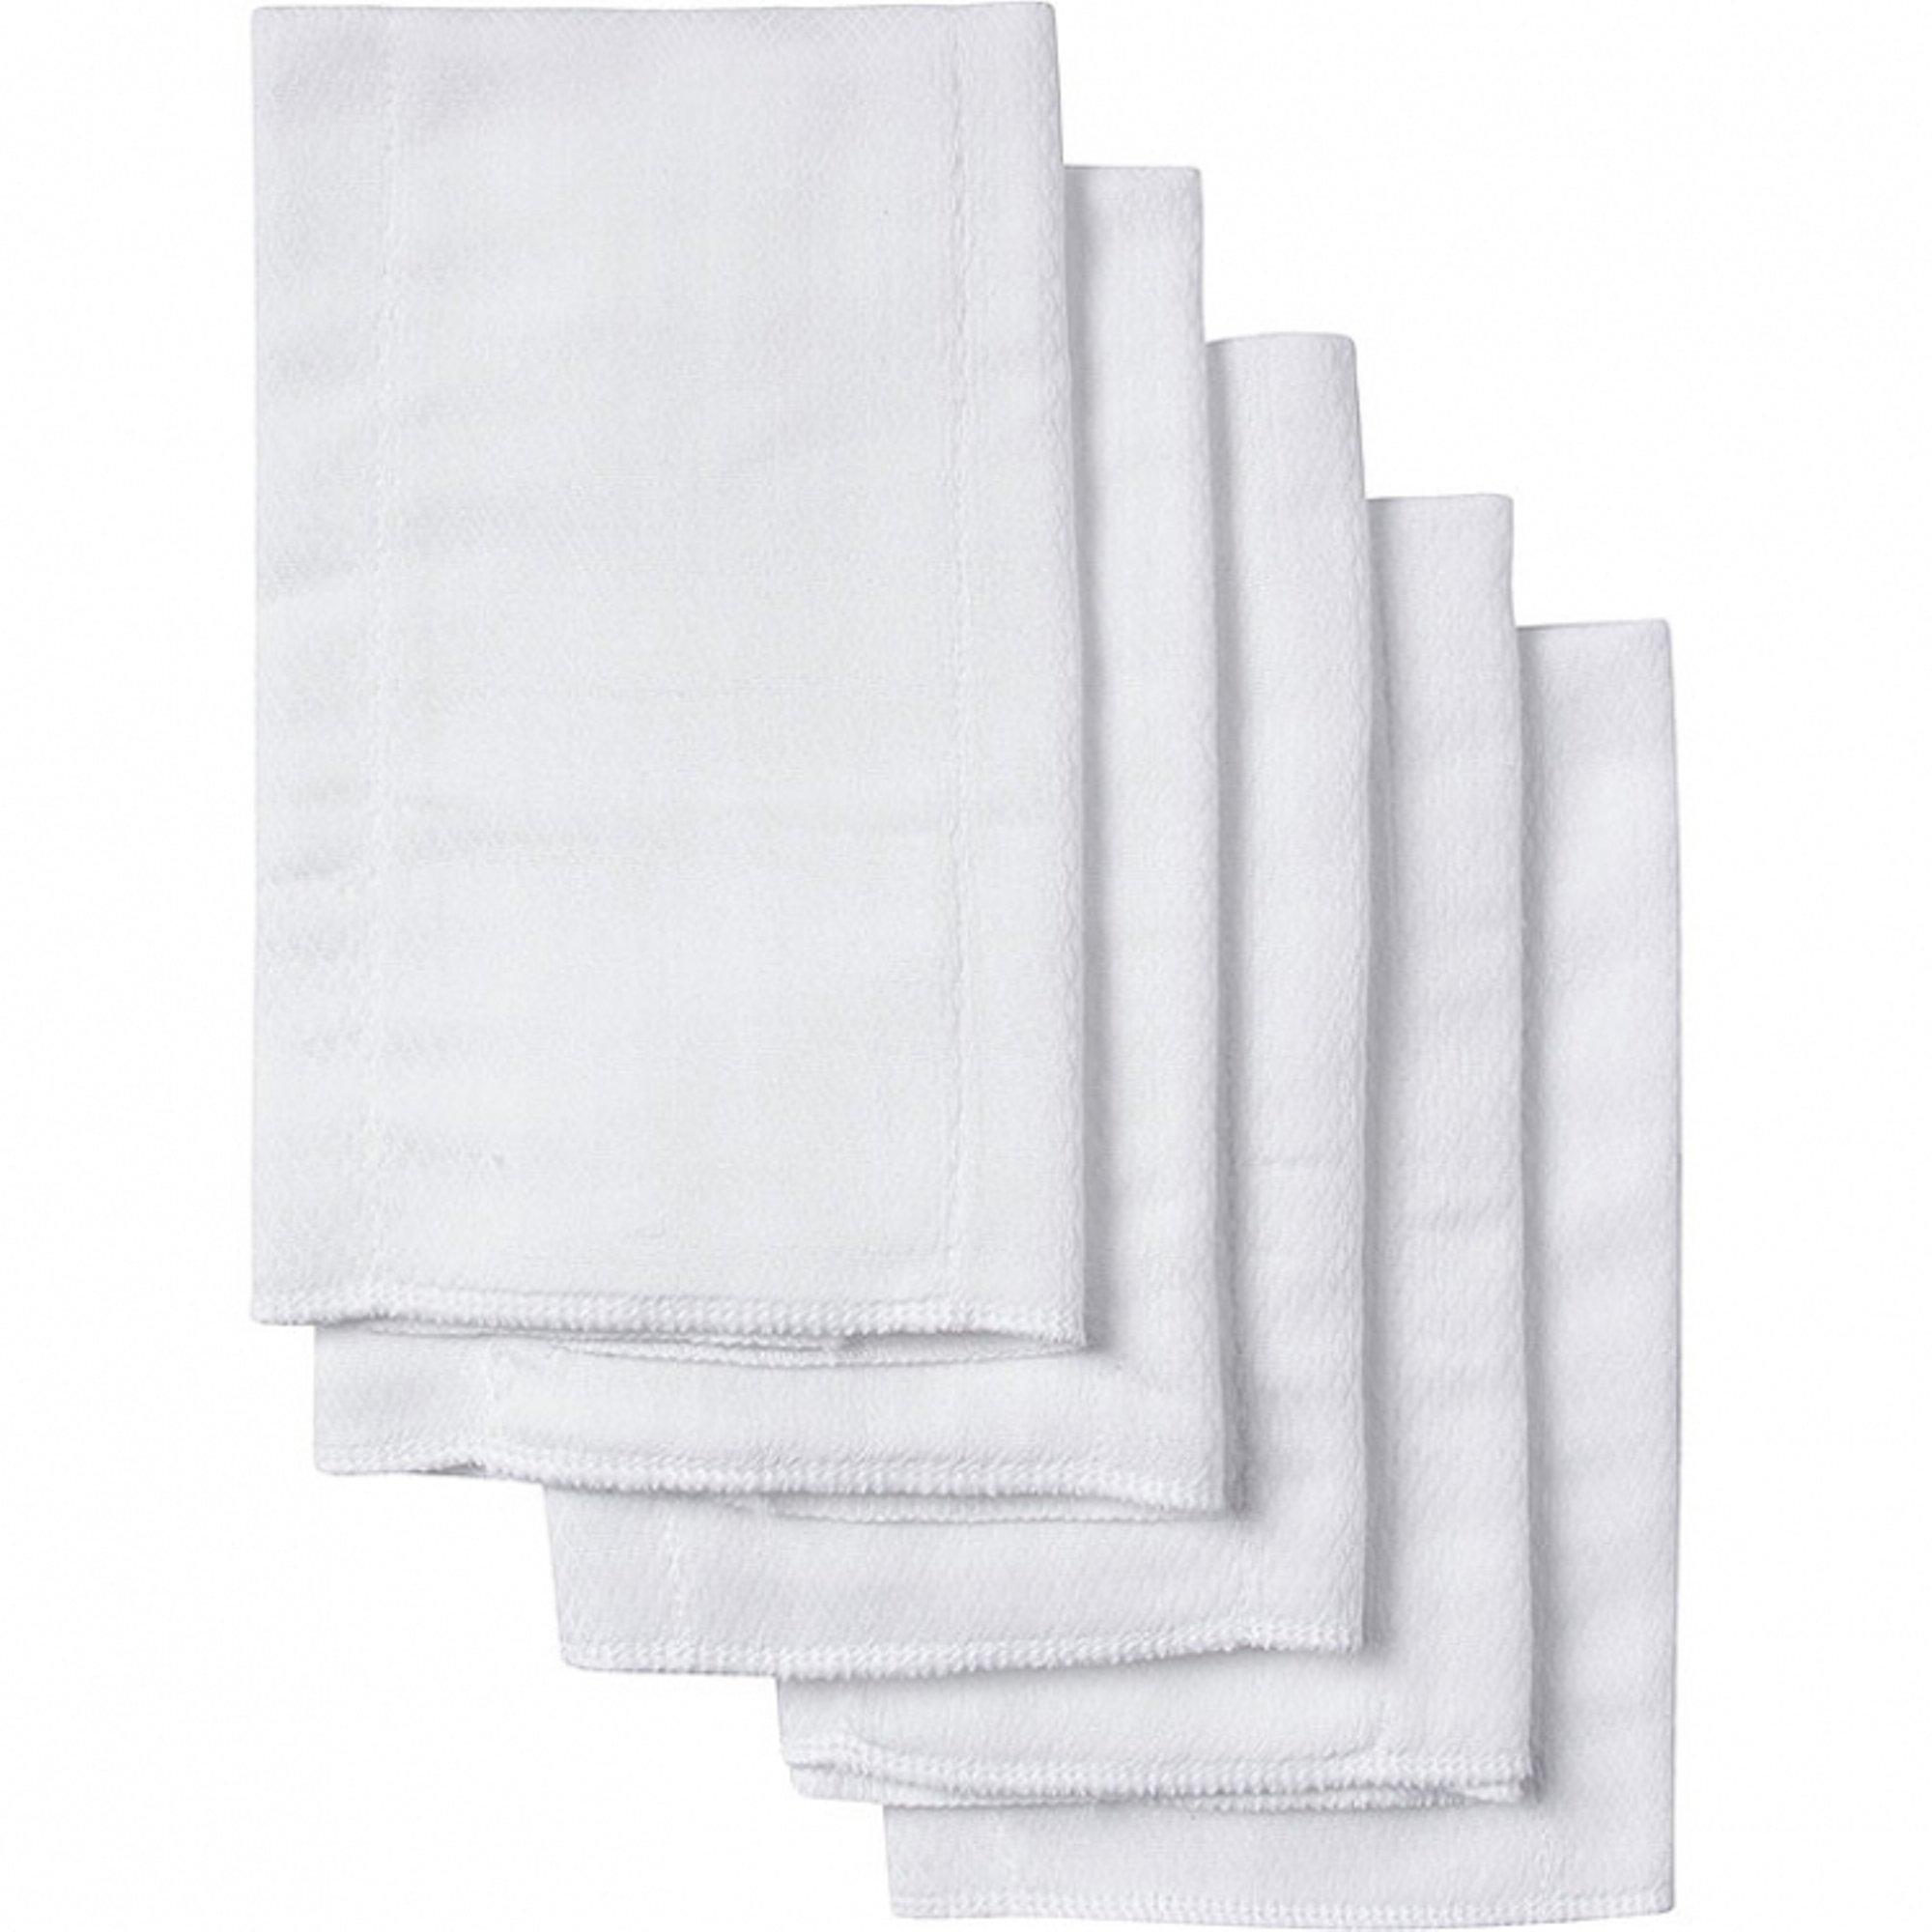 Gerber 5 Count Organic Birdseye Prefold Cloth Diaper, White by GERBER